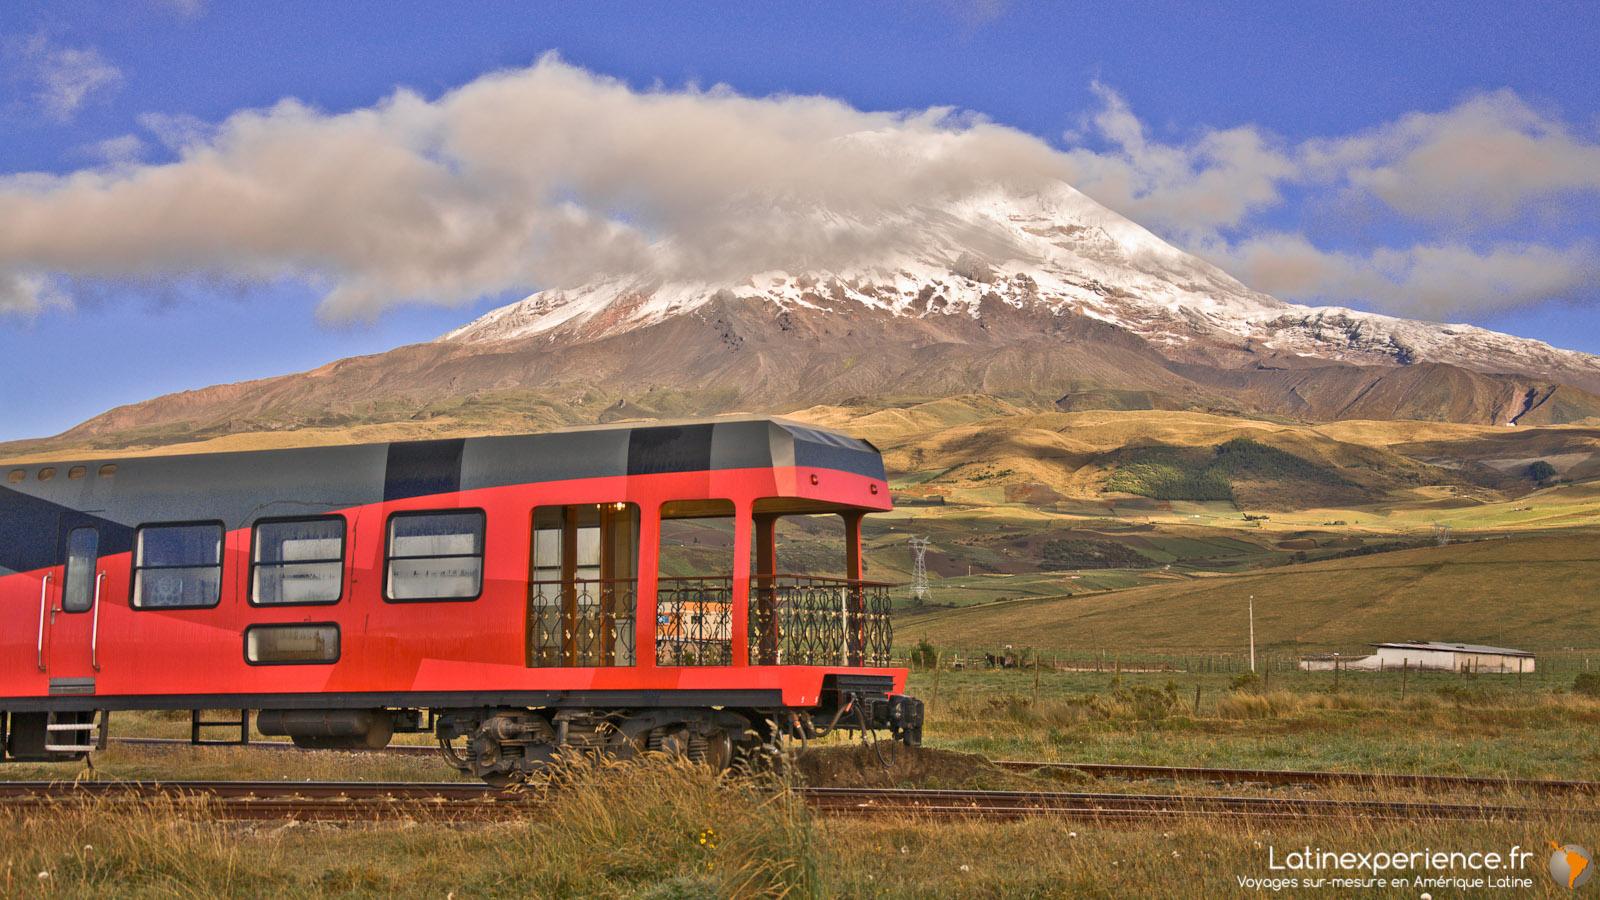 Equateur - Volcan Chimborazo